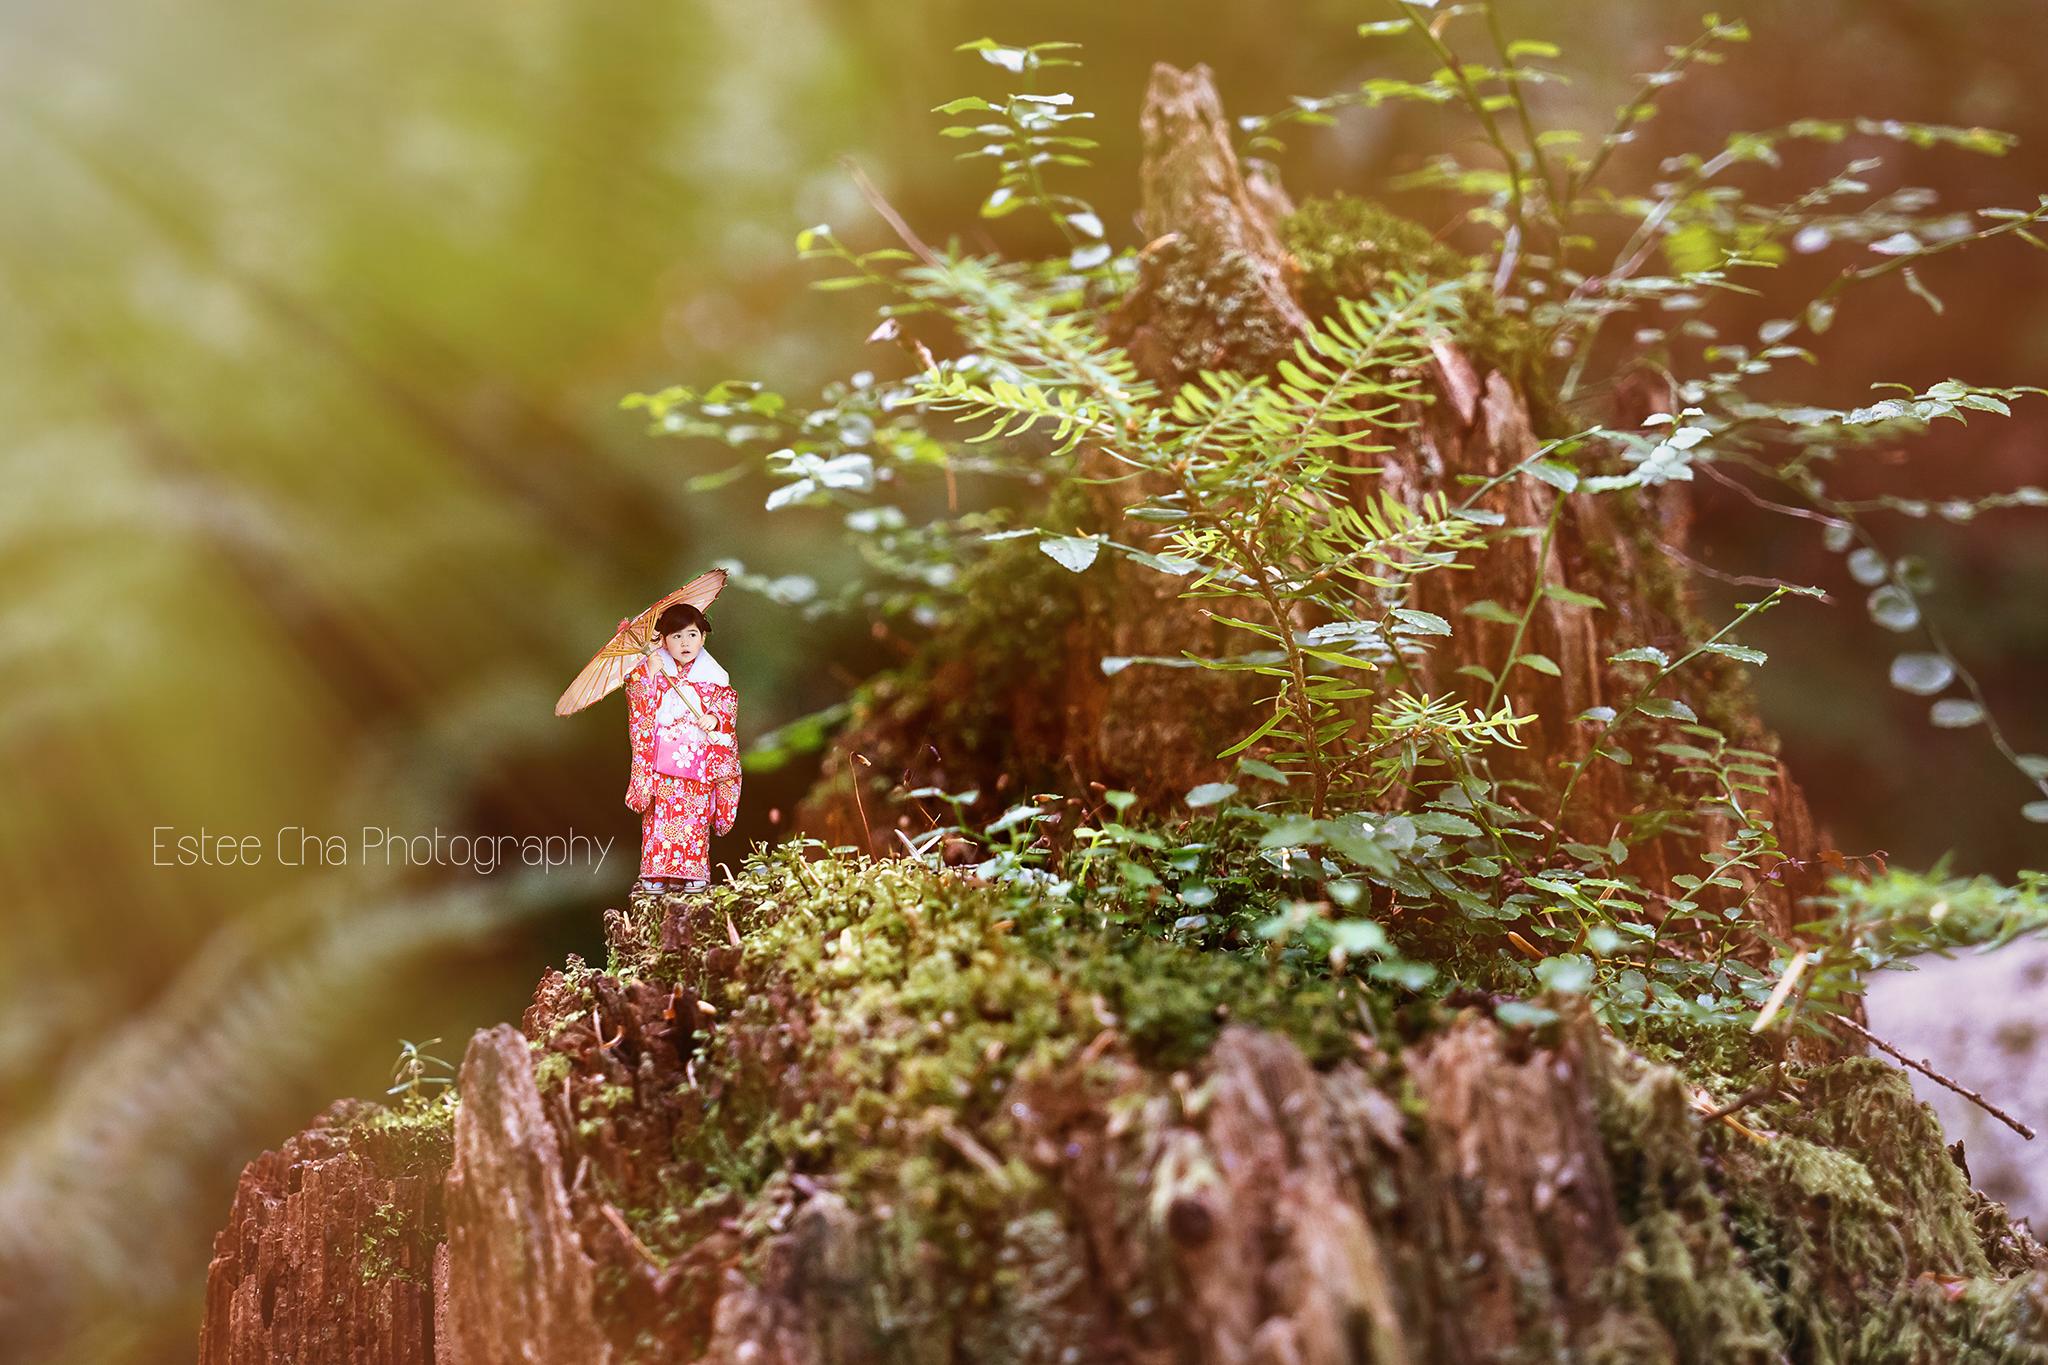 ©Estee Cha Photography